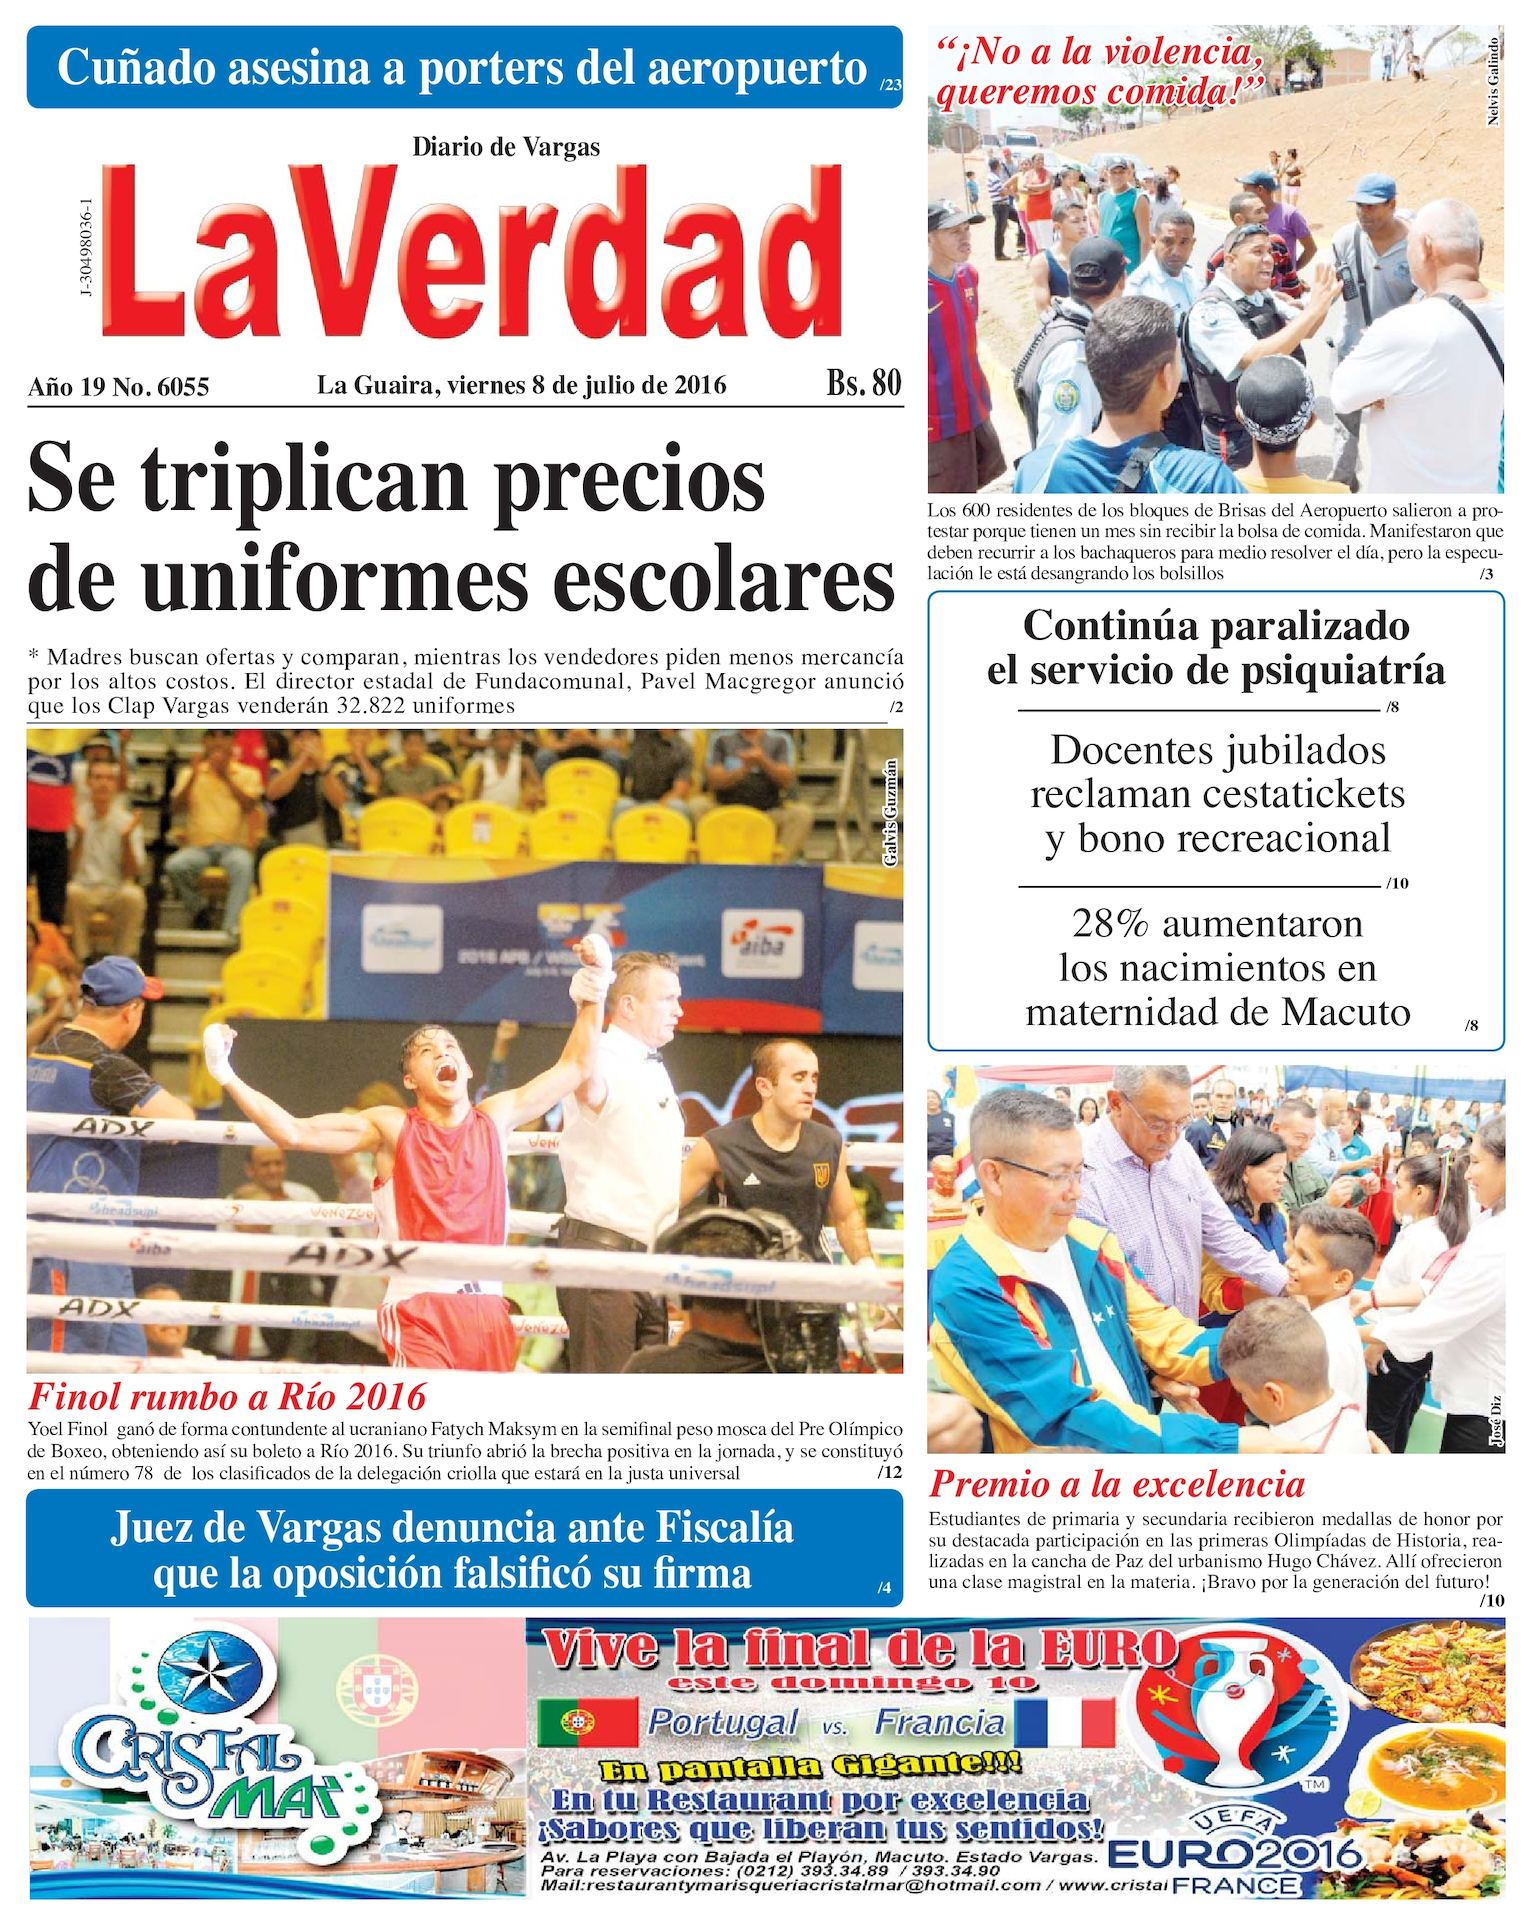 33ca73b681 Calaméo - La Guaira, viernes 8 de julio de 2016 Año 19 Nº. 6055